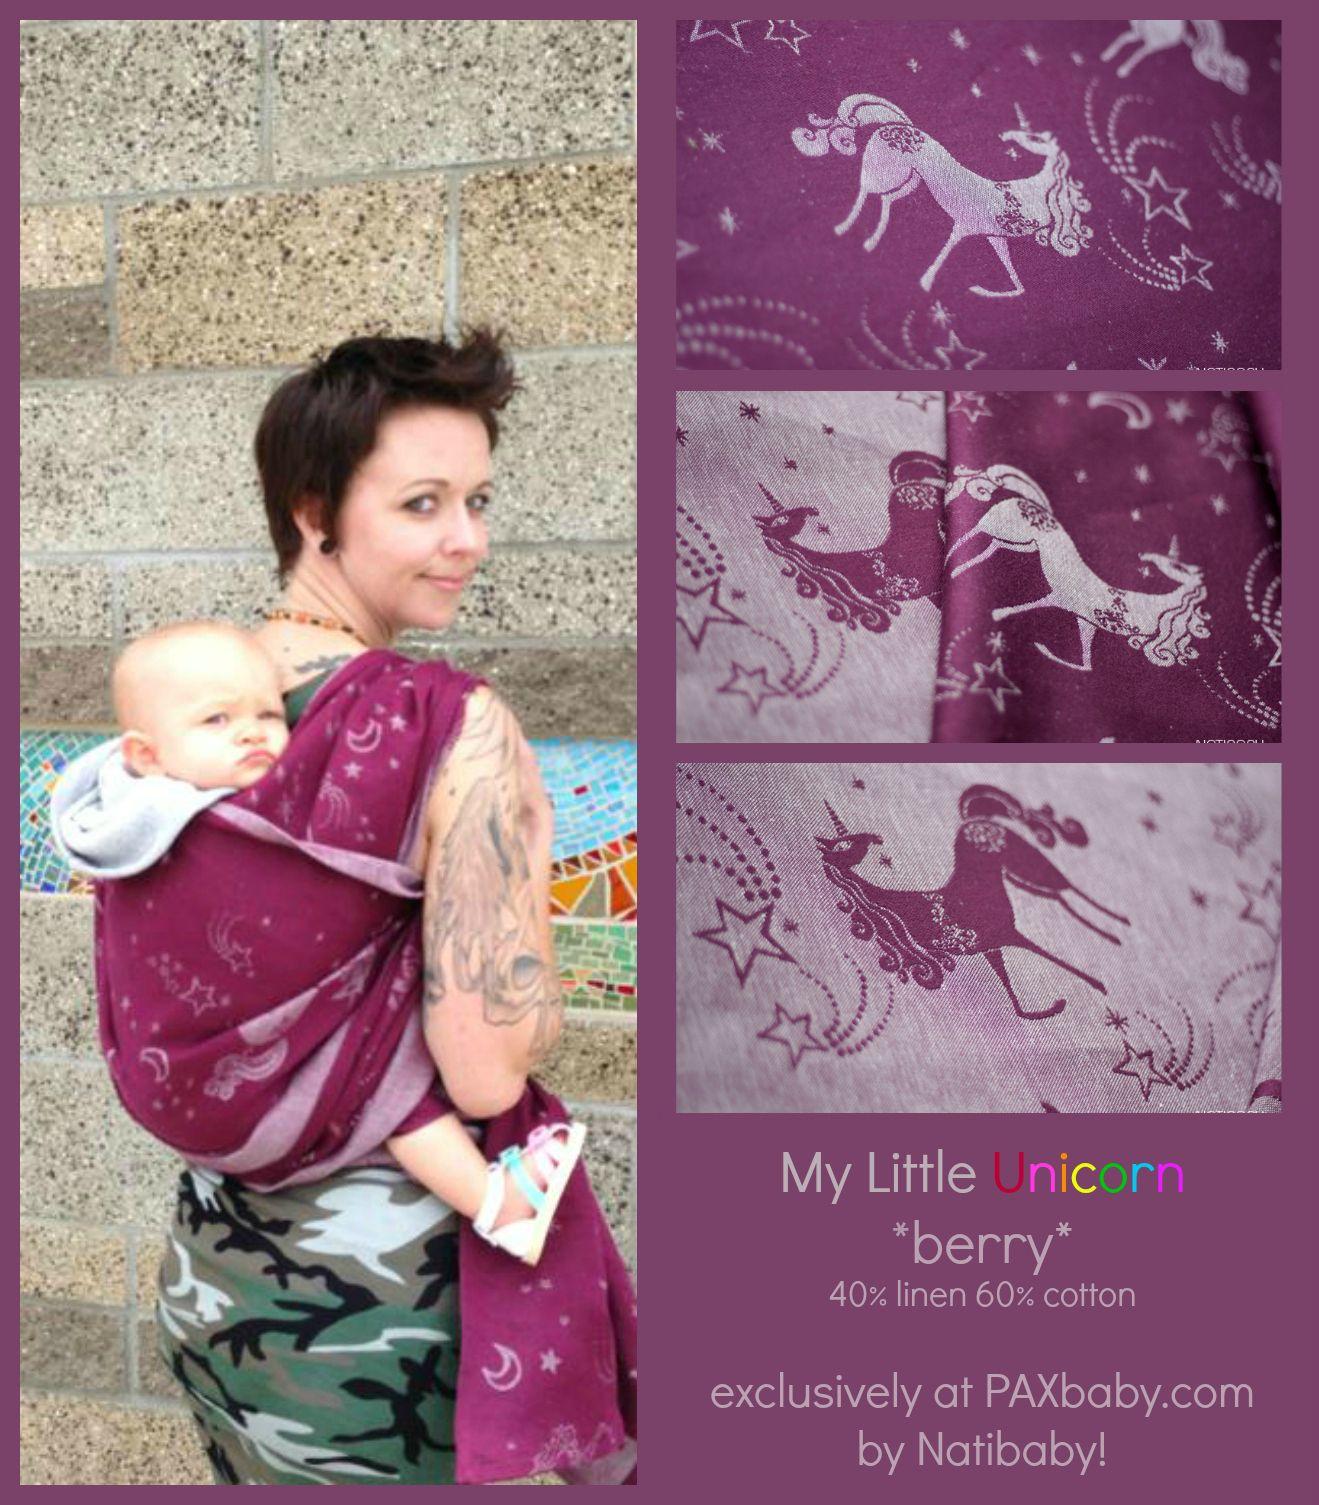 My Little Unicorn Paxbaby Berry Natibaby Babywearing Wishes